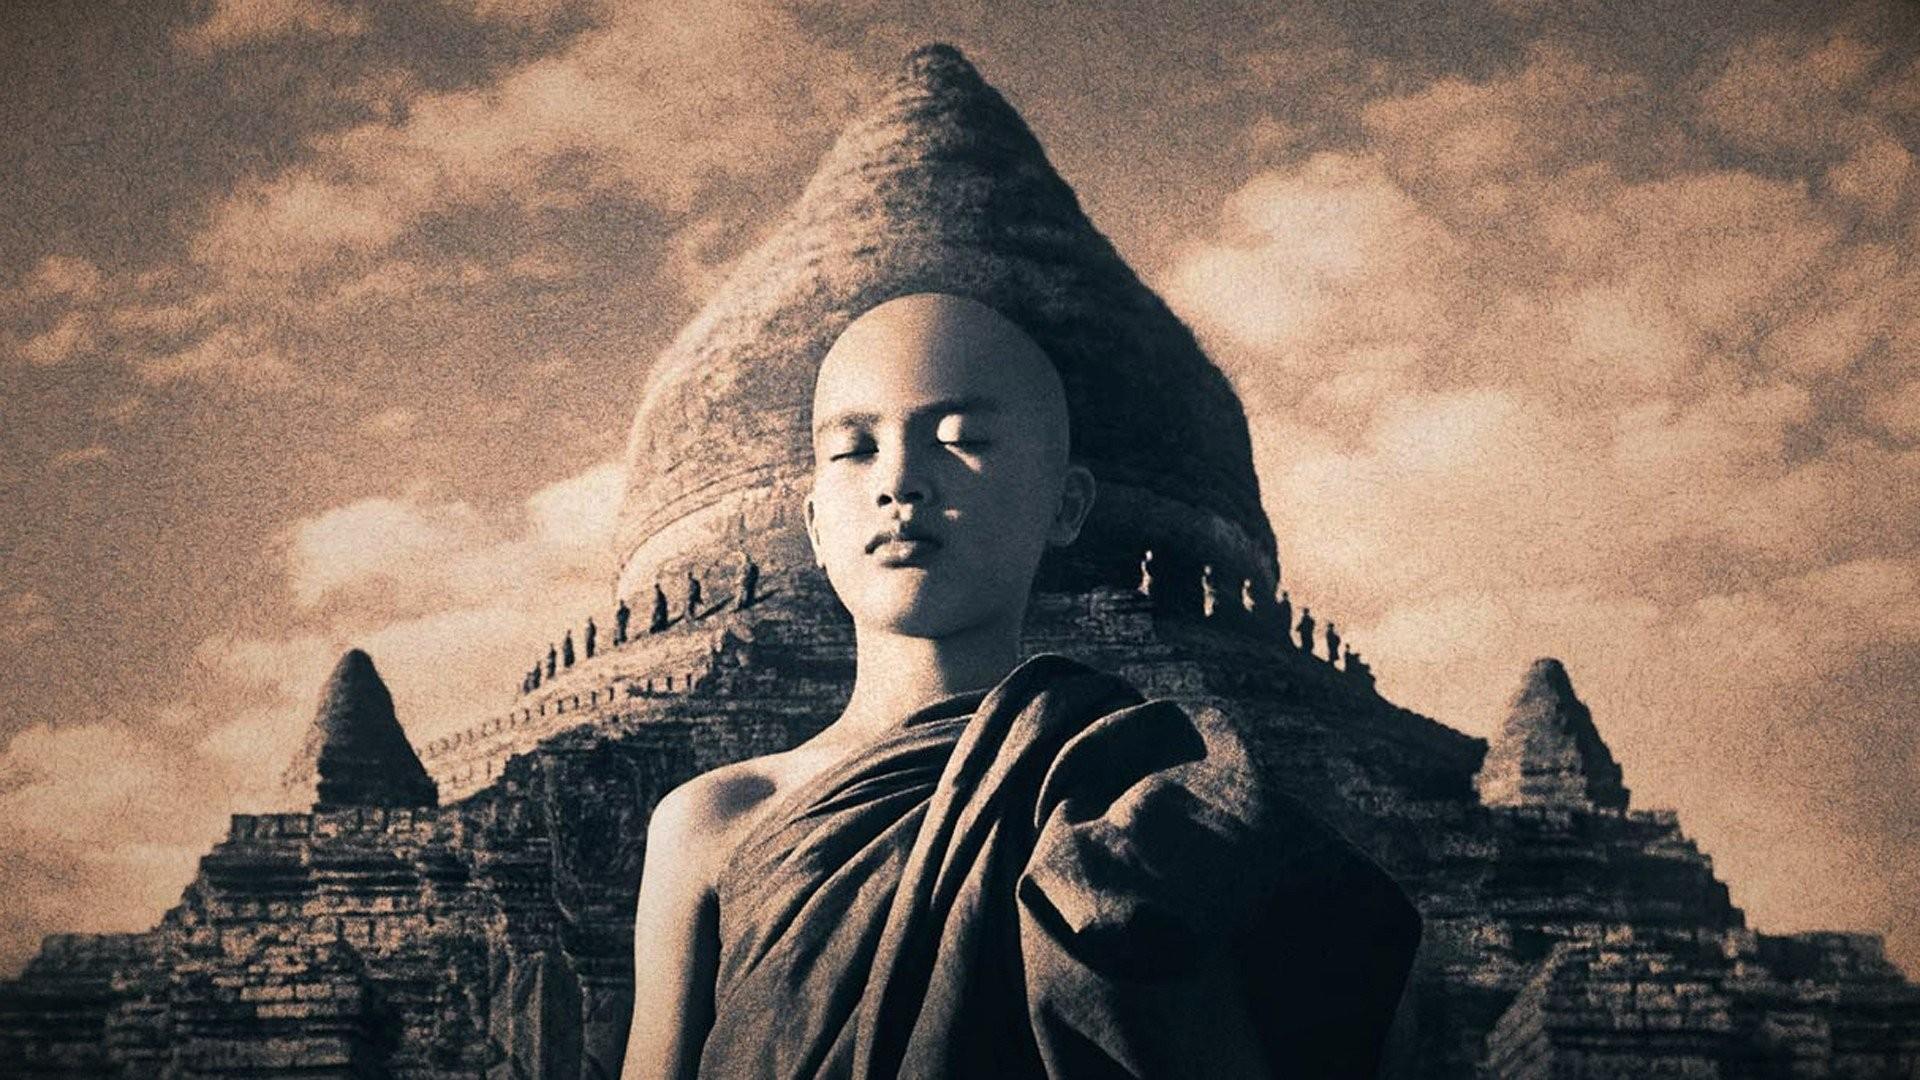 Buddha Wallpaper 1920x1080 (79+ images)